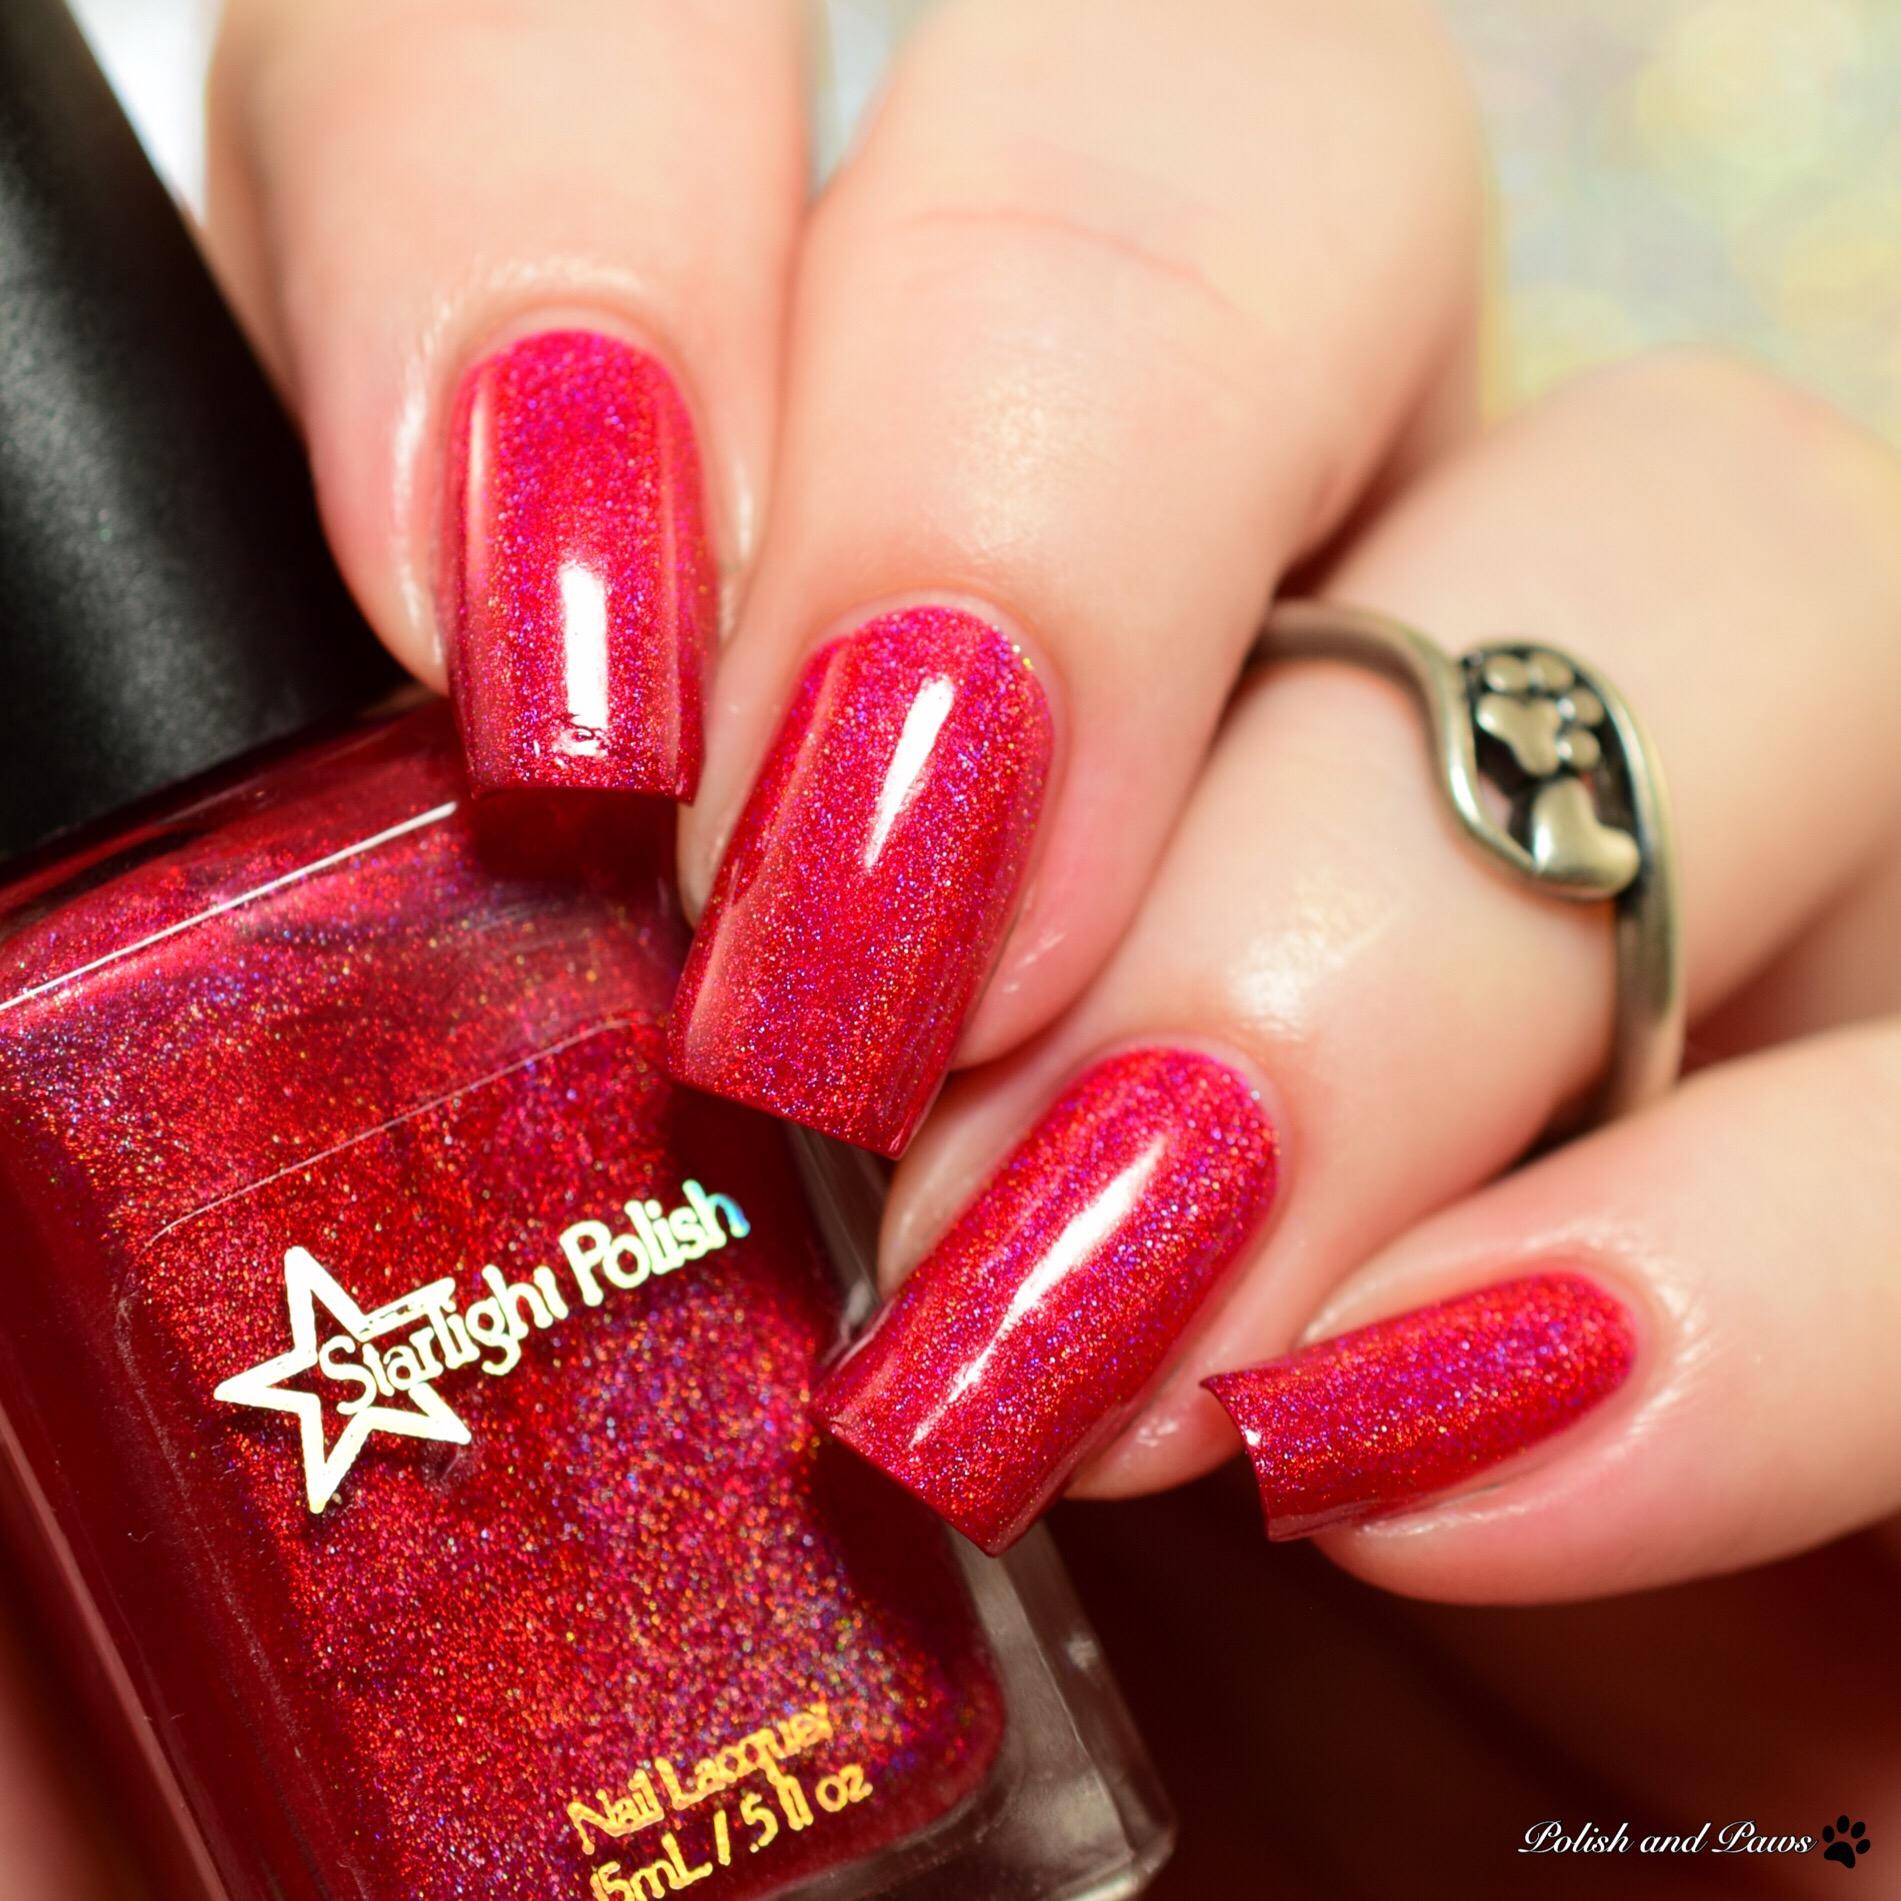 Starlight Polish Poinsettia